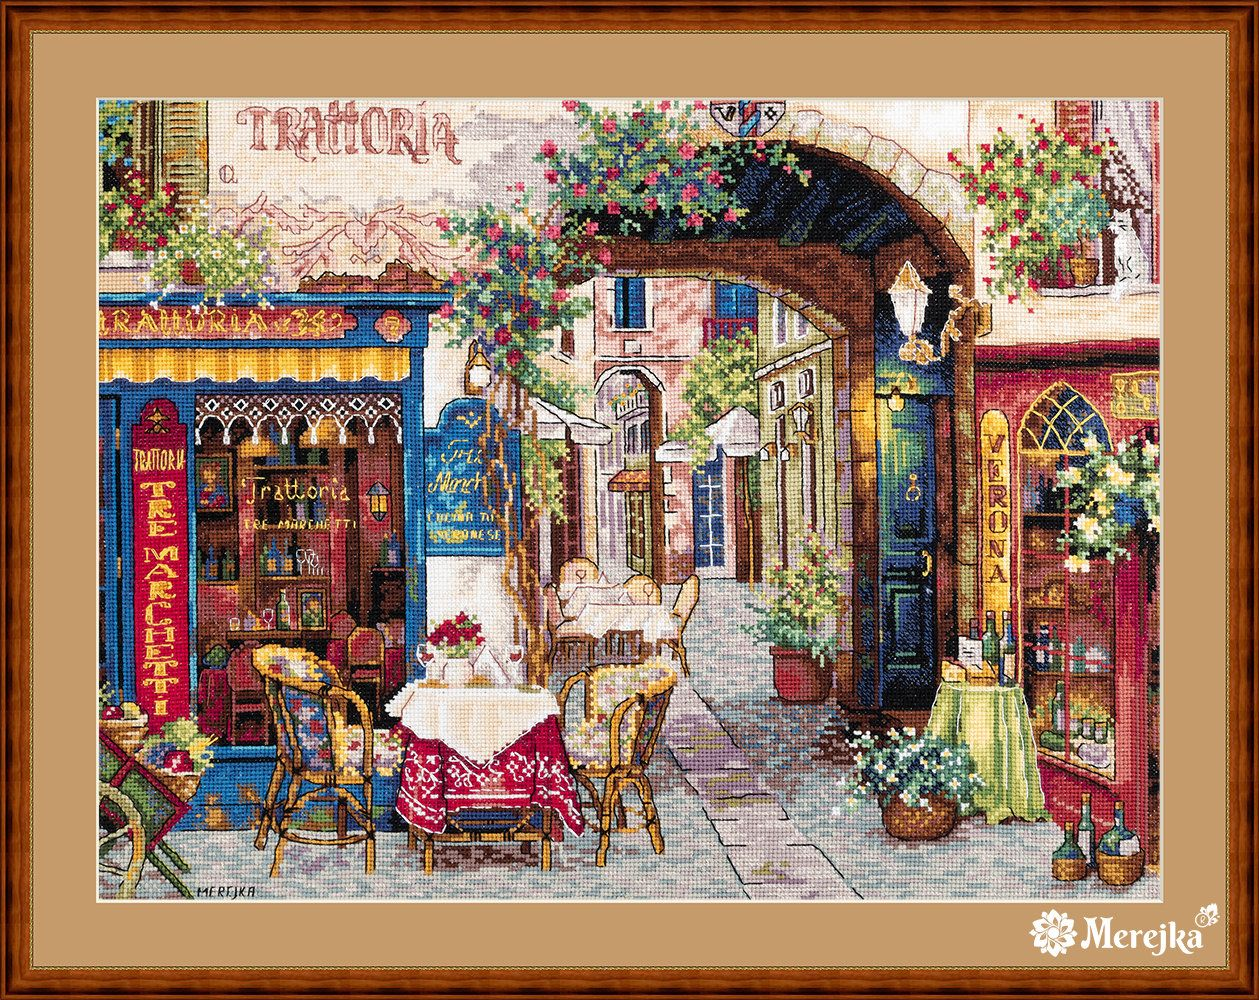 Merejka Cross Stitch Kit Cafe In Verona After V Shvaiko Painting 161 Butterfly Cross Stitch Cross Stitch Kits Cross Stitch